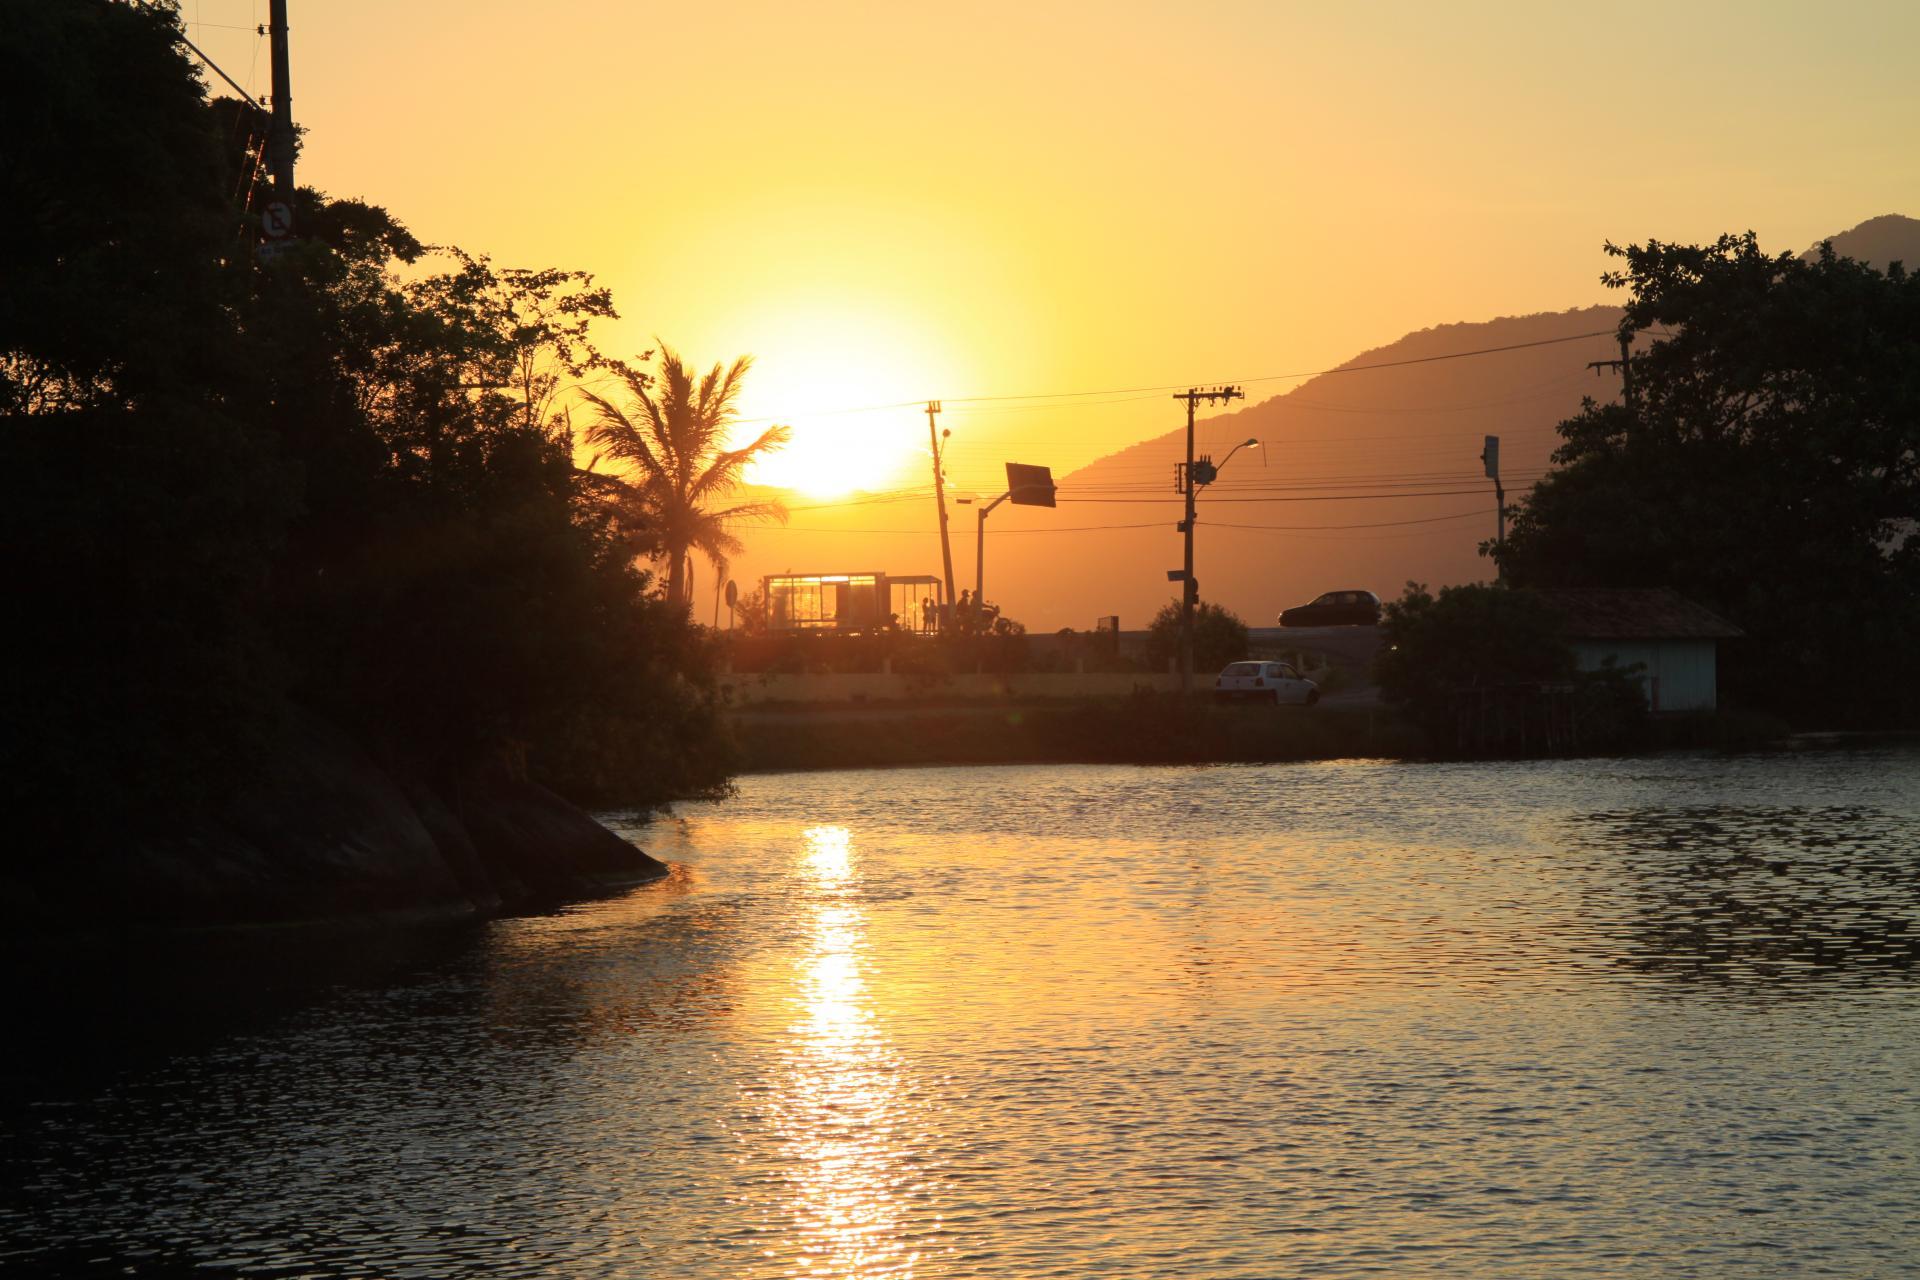 Sonnenuntergang in Florianopolis